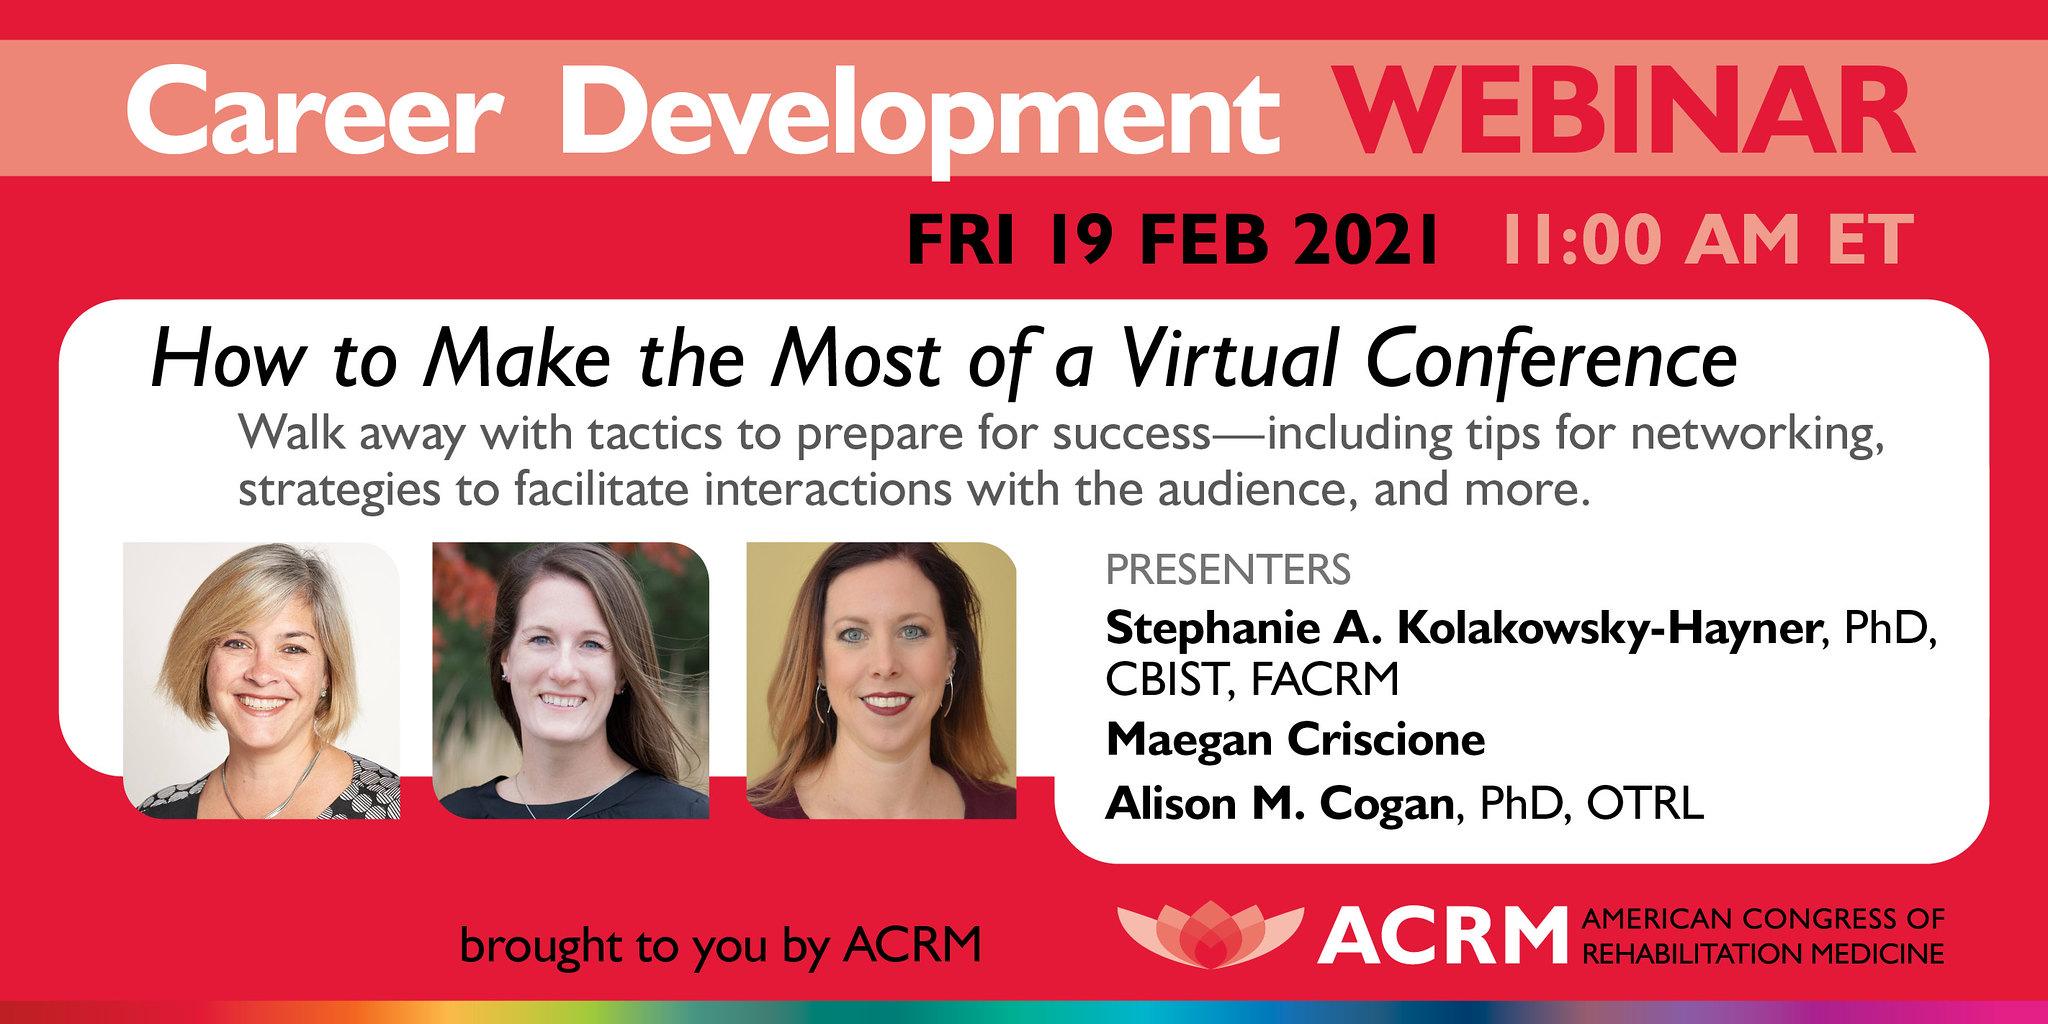 ACRM Career Development webiner image